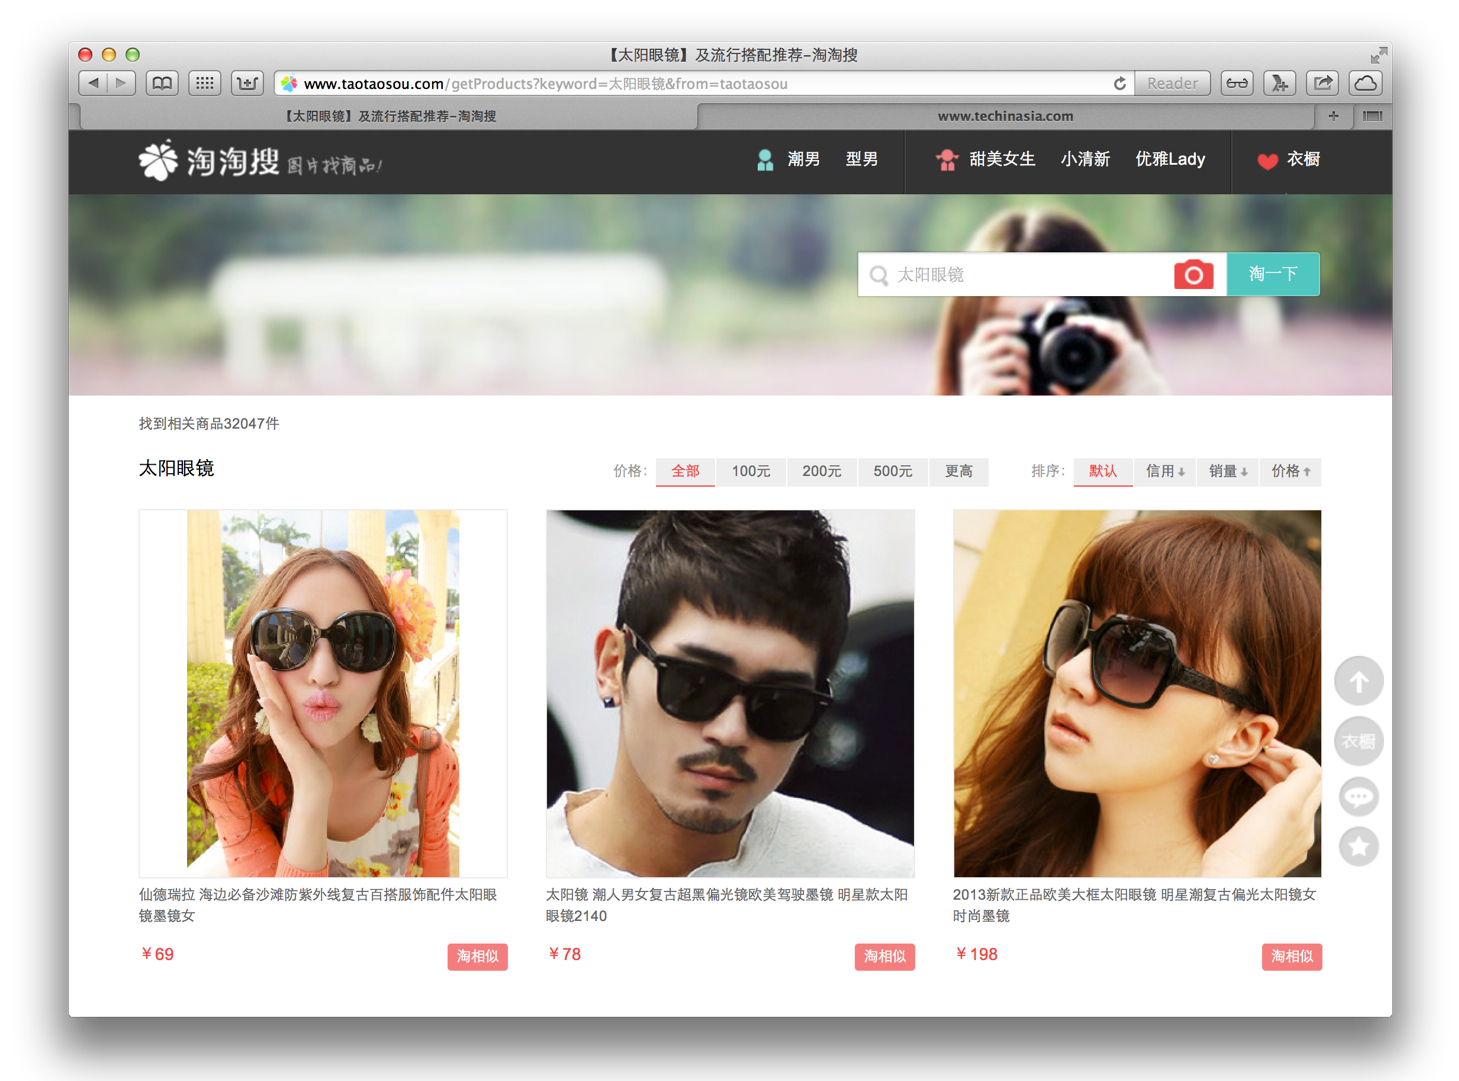 TaoTaoSou Finds Huge New Funding Round